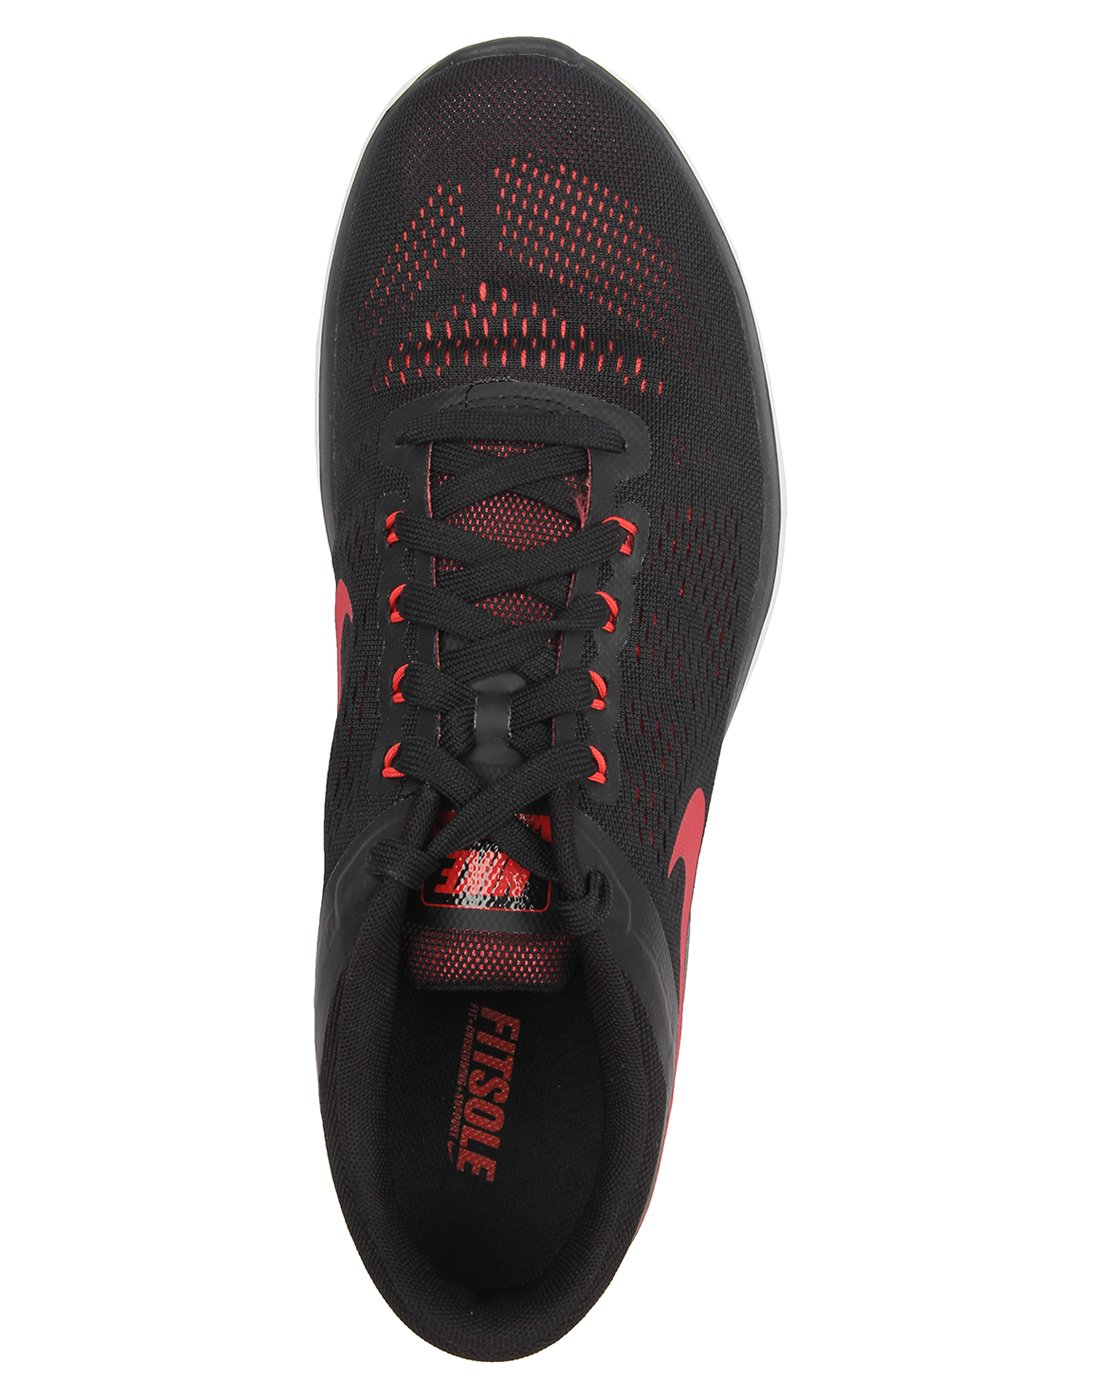 NIKE Men's Flex 2014 RN Running Shoe B01CITM2VU 10 D(M) US|Black/University Red/Ember Glow/White